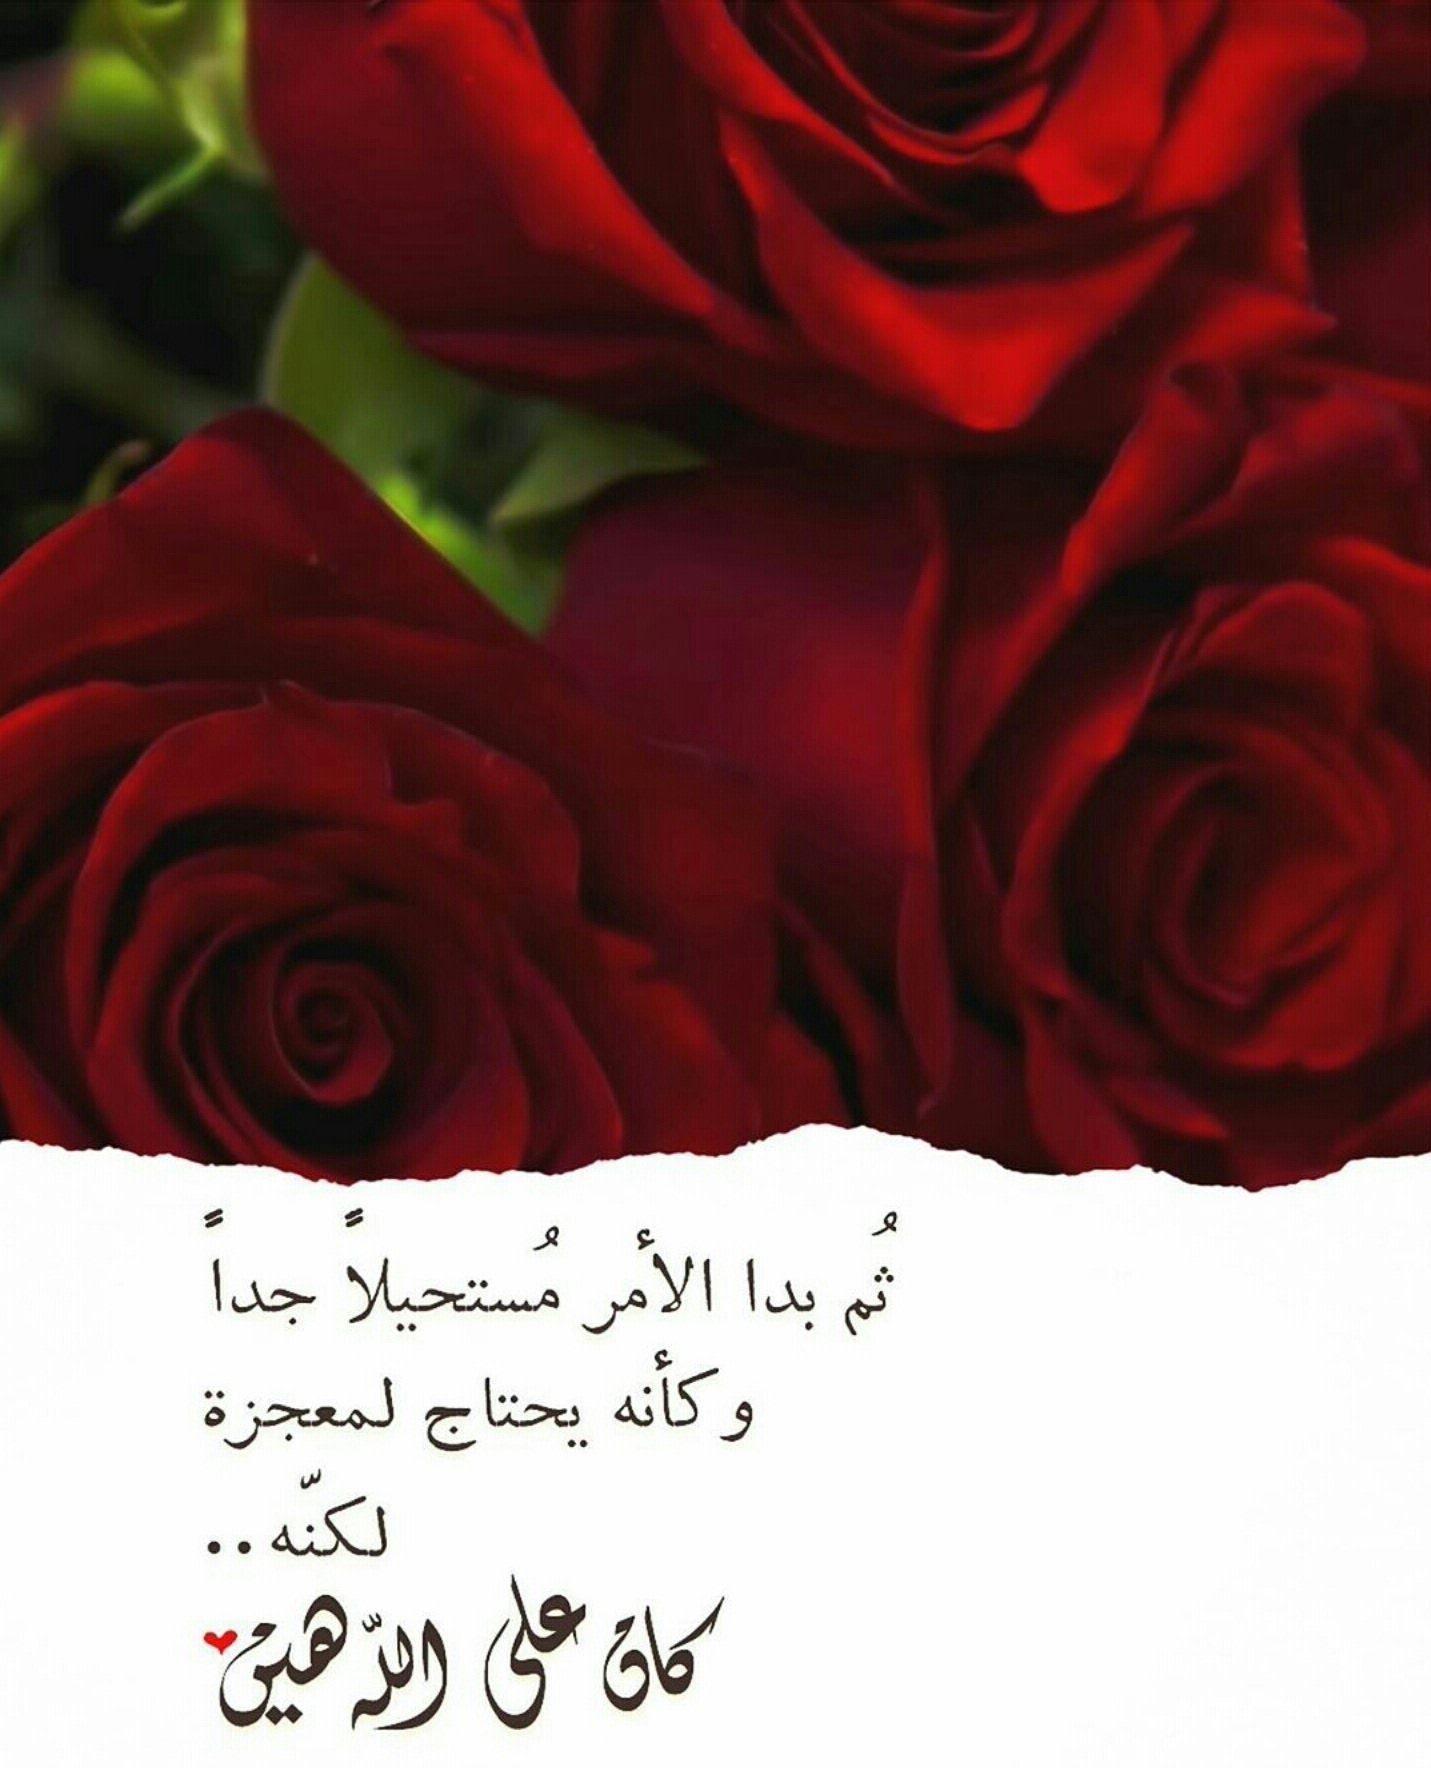 Pin by صورة و كلمة on مواعظ ☘️ خواطر إسلامية ️ Flowers